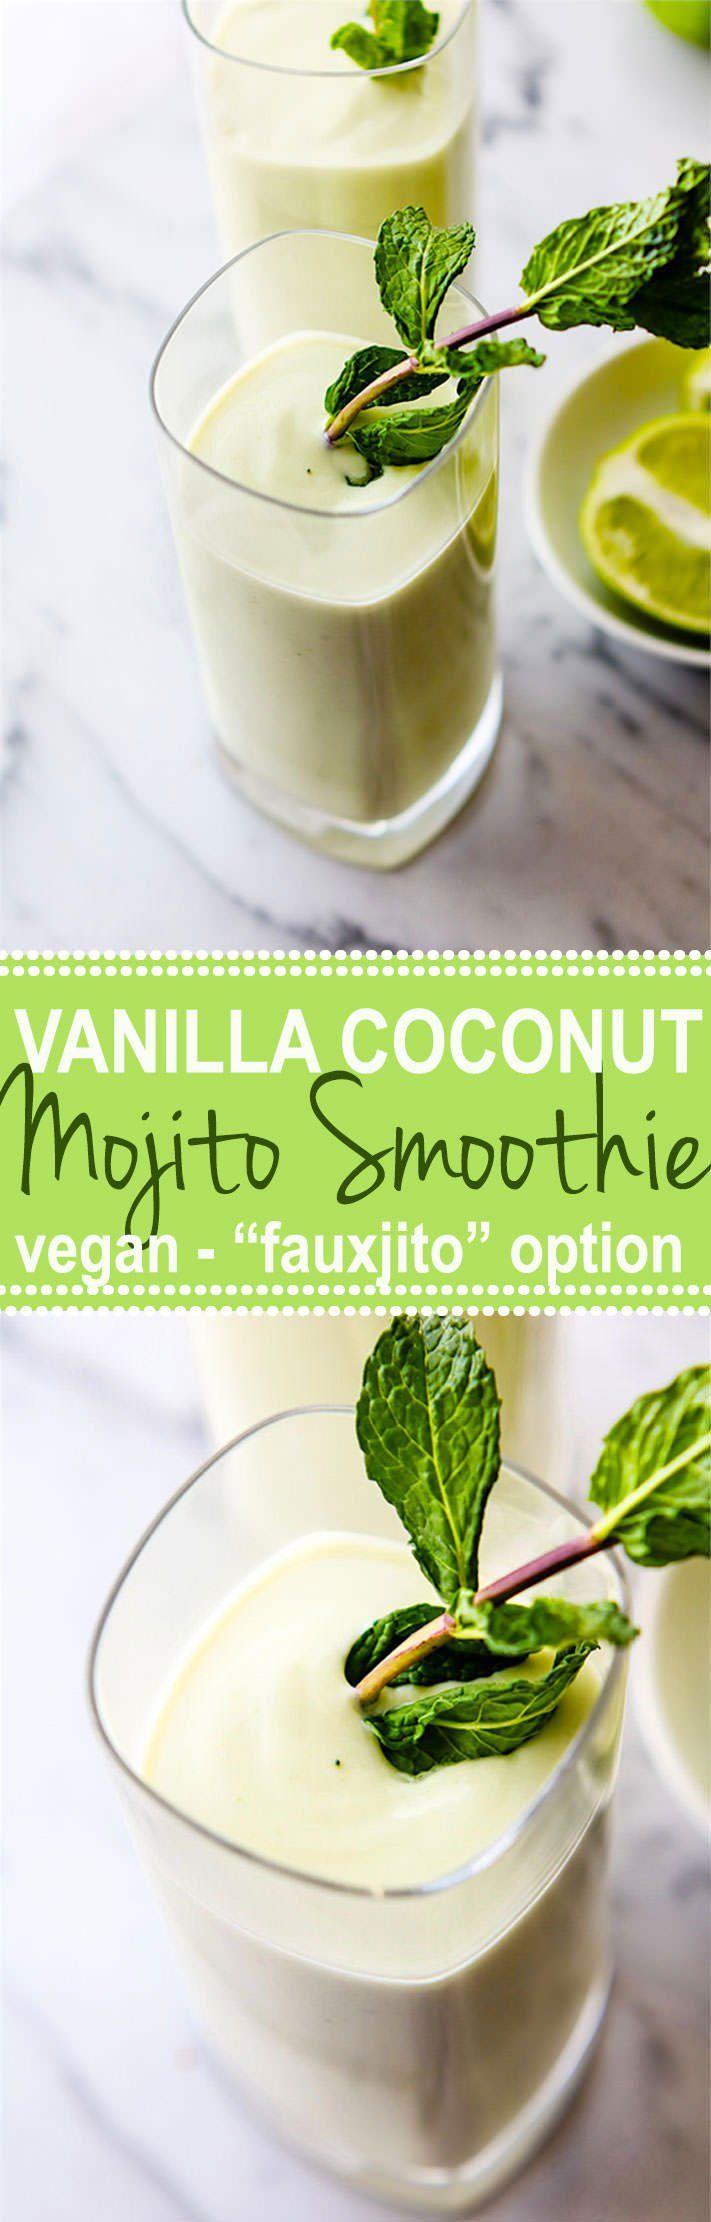 "Vegan Creamy Vanilla Coconut Mojito Smoothie (""Fauxjito"" Mocktail Option)"